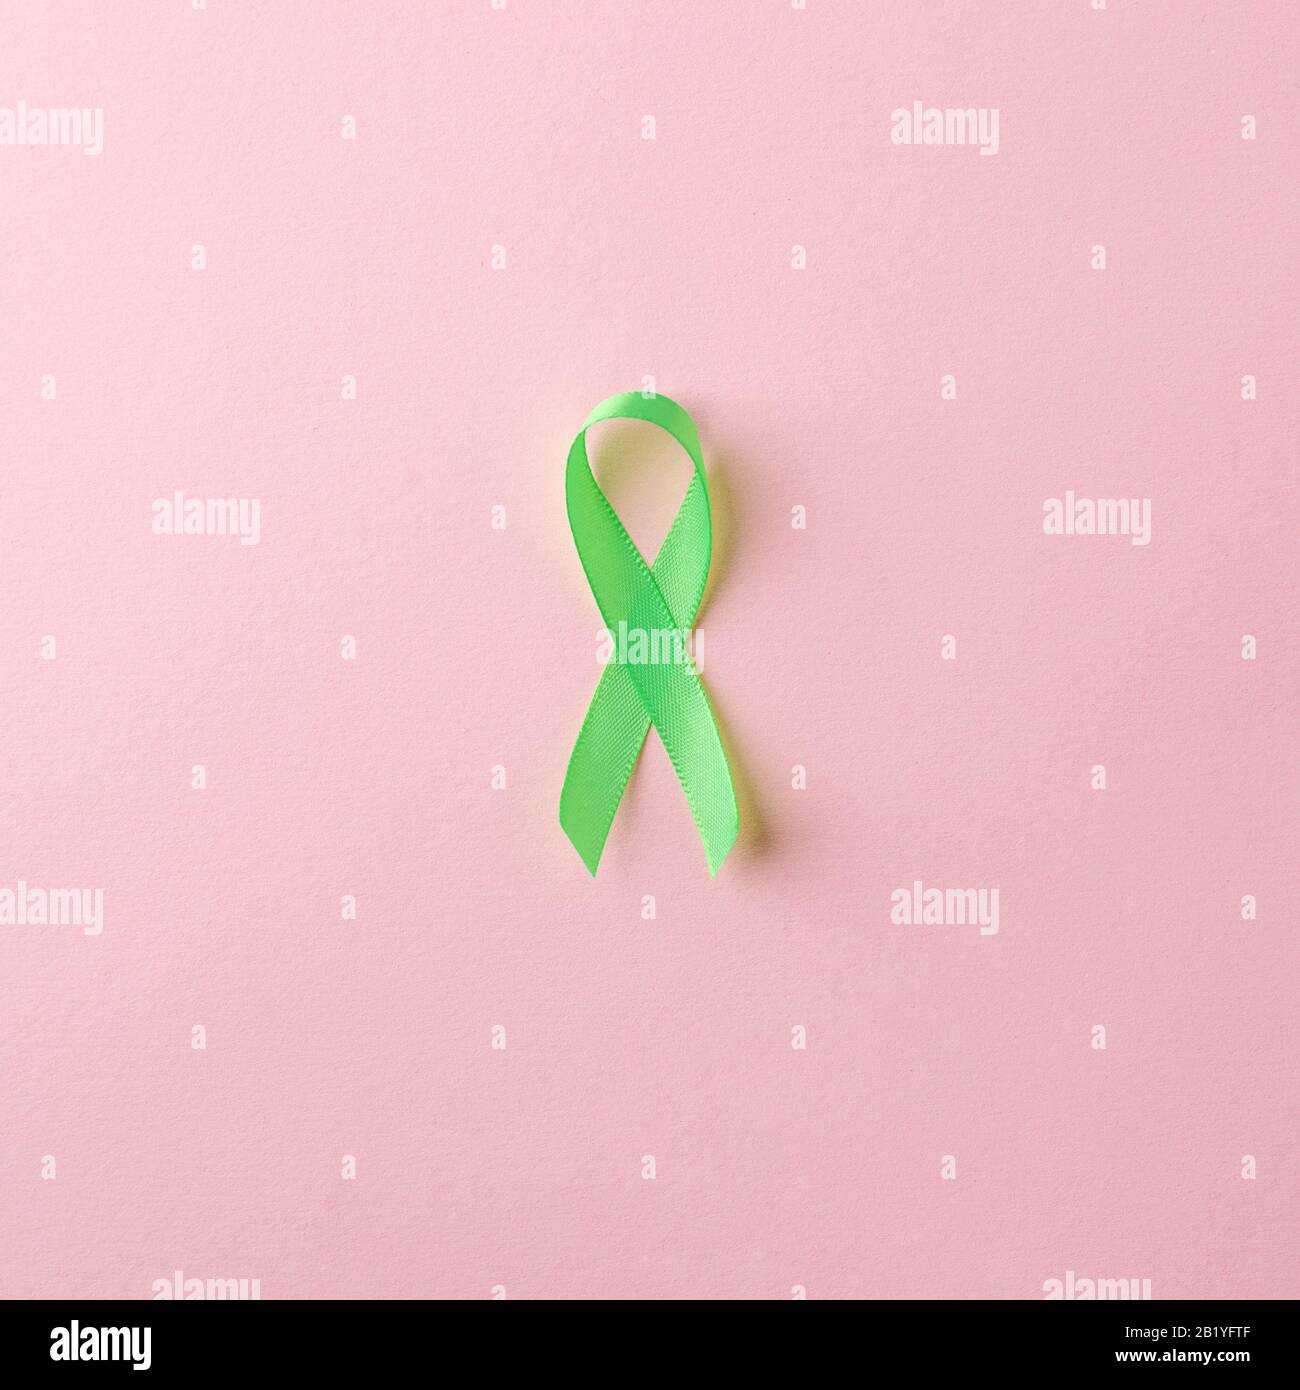 Green Satin Ribbon On Pink Background Liver Kidney Cancer Awareness Glaucoma Awareness Stock Photo Alamy